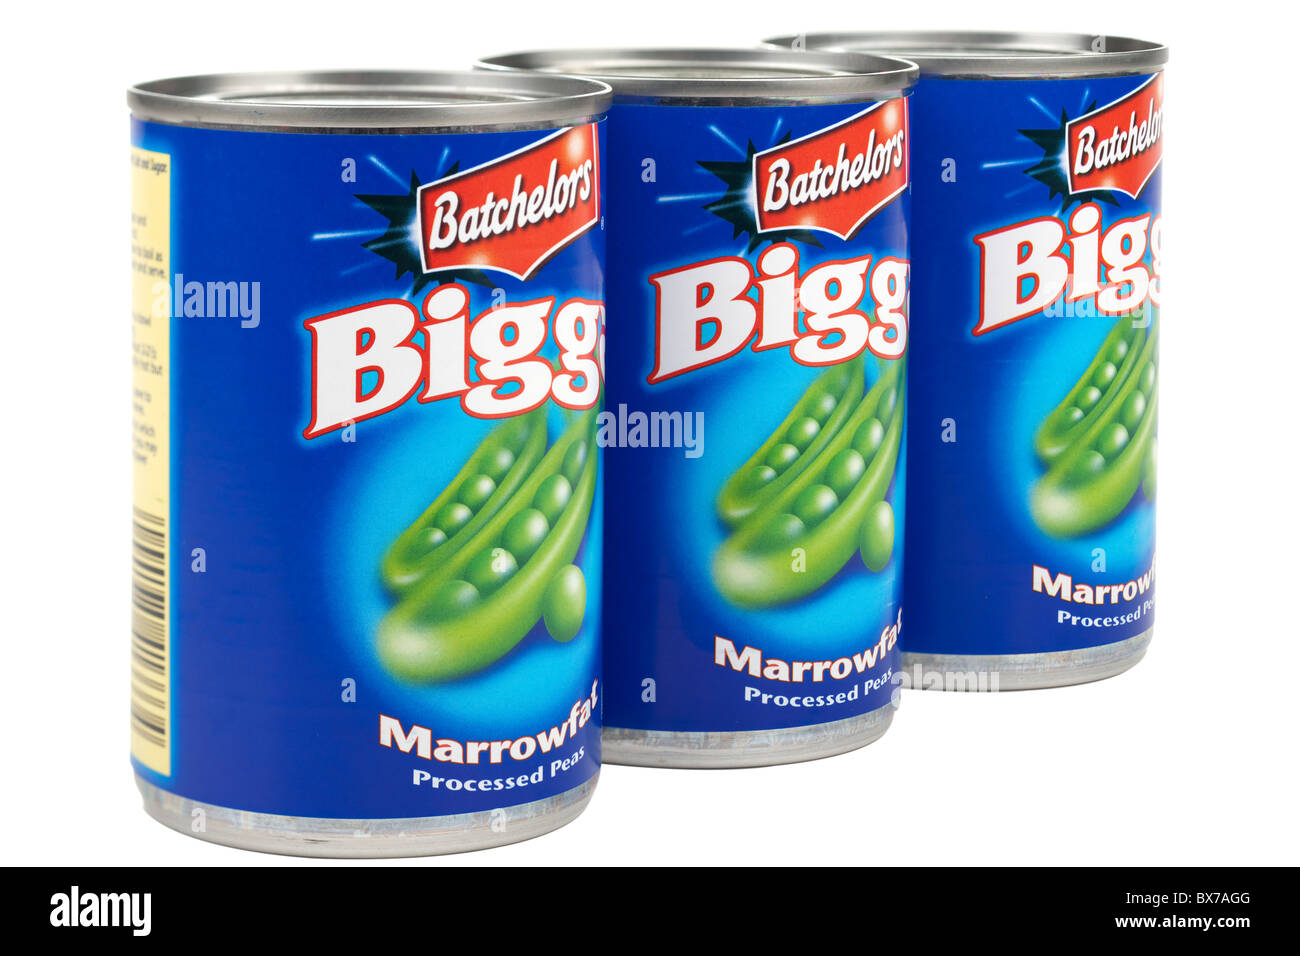 Three tins of Batchelor's Bigga Marrowfat peas - Stock Image